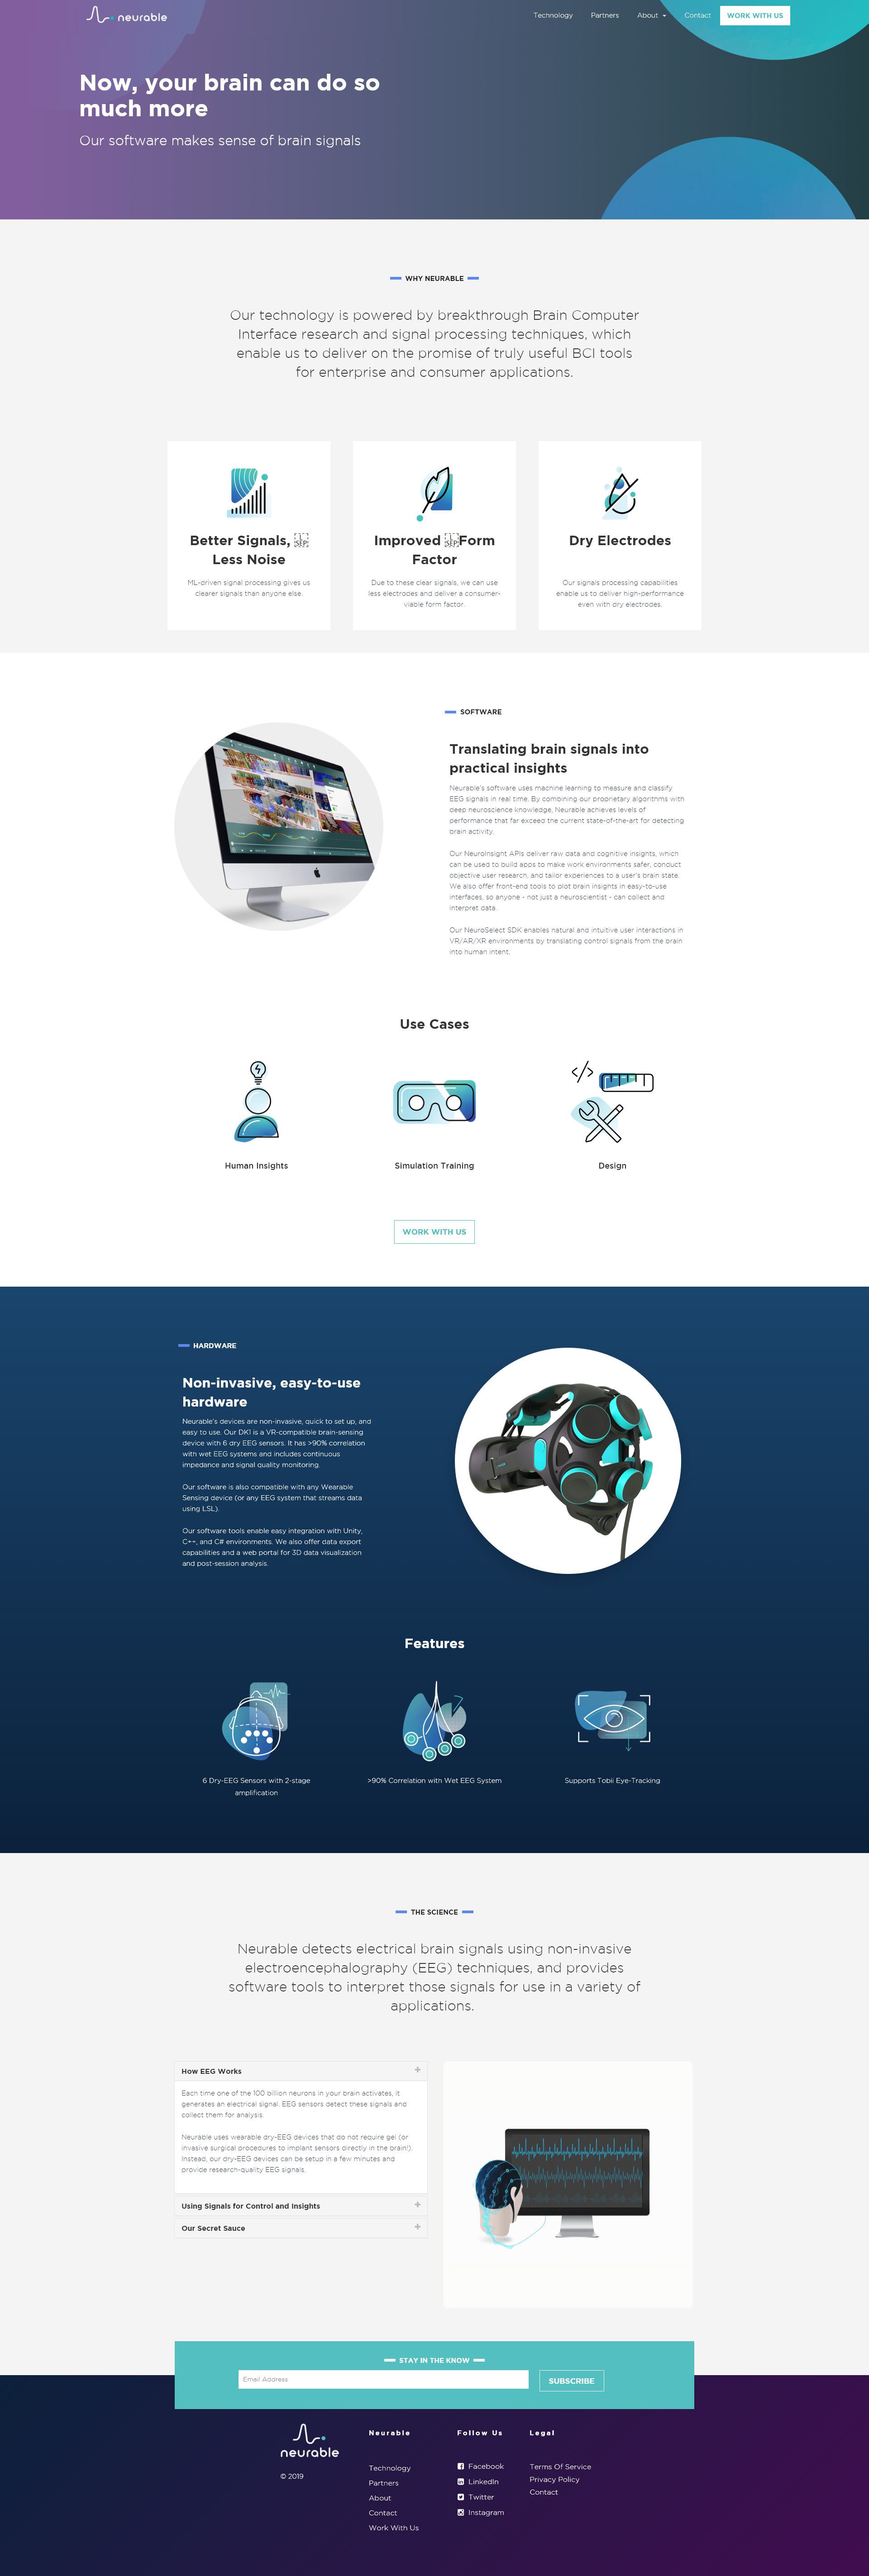 Neurable Enterprise Website Development and Design Project